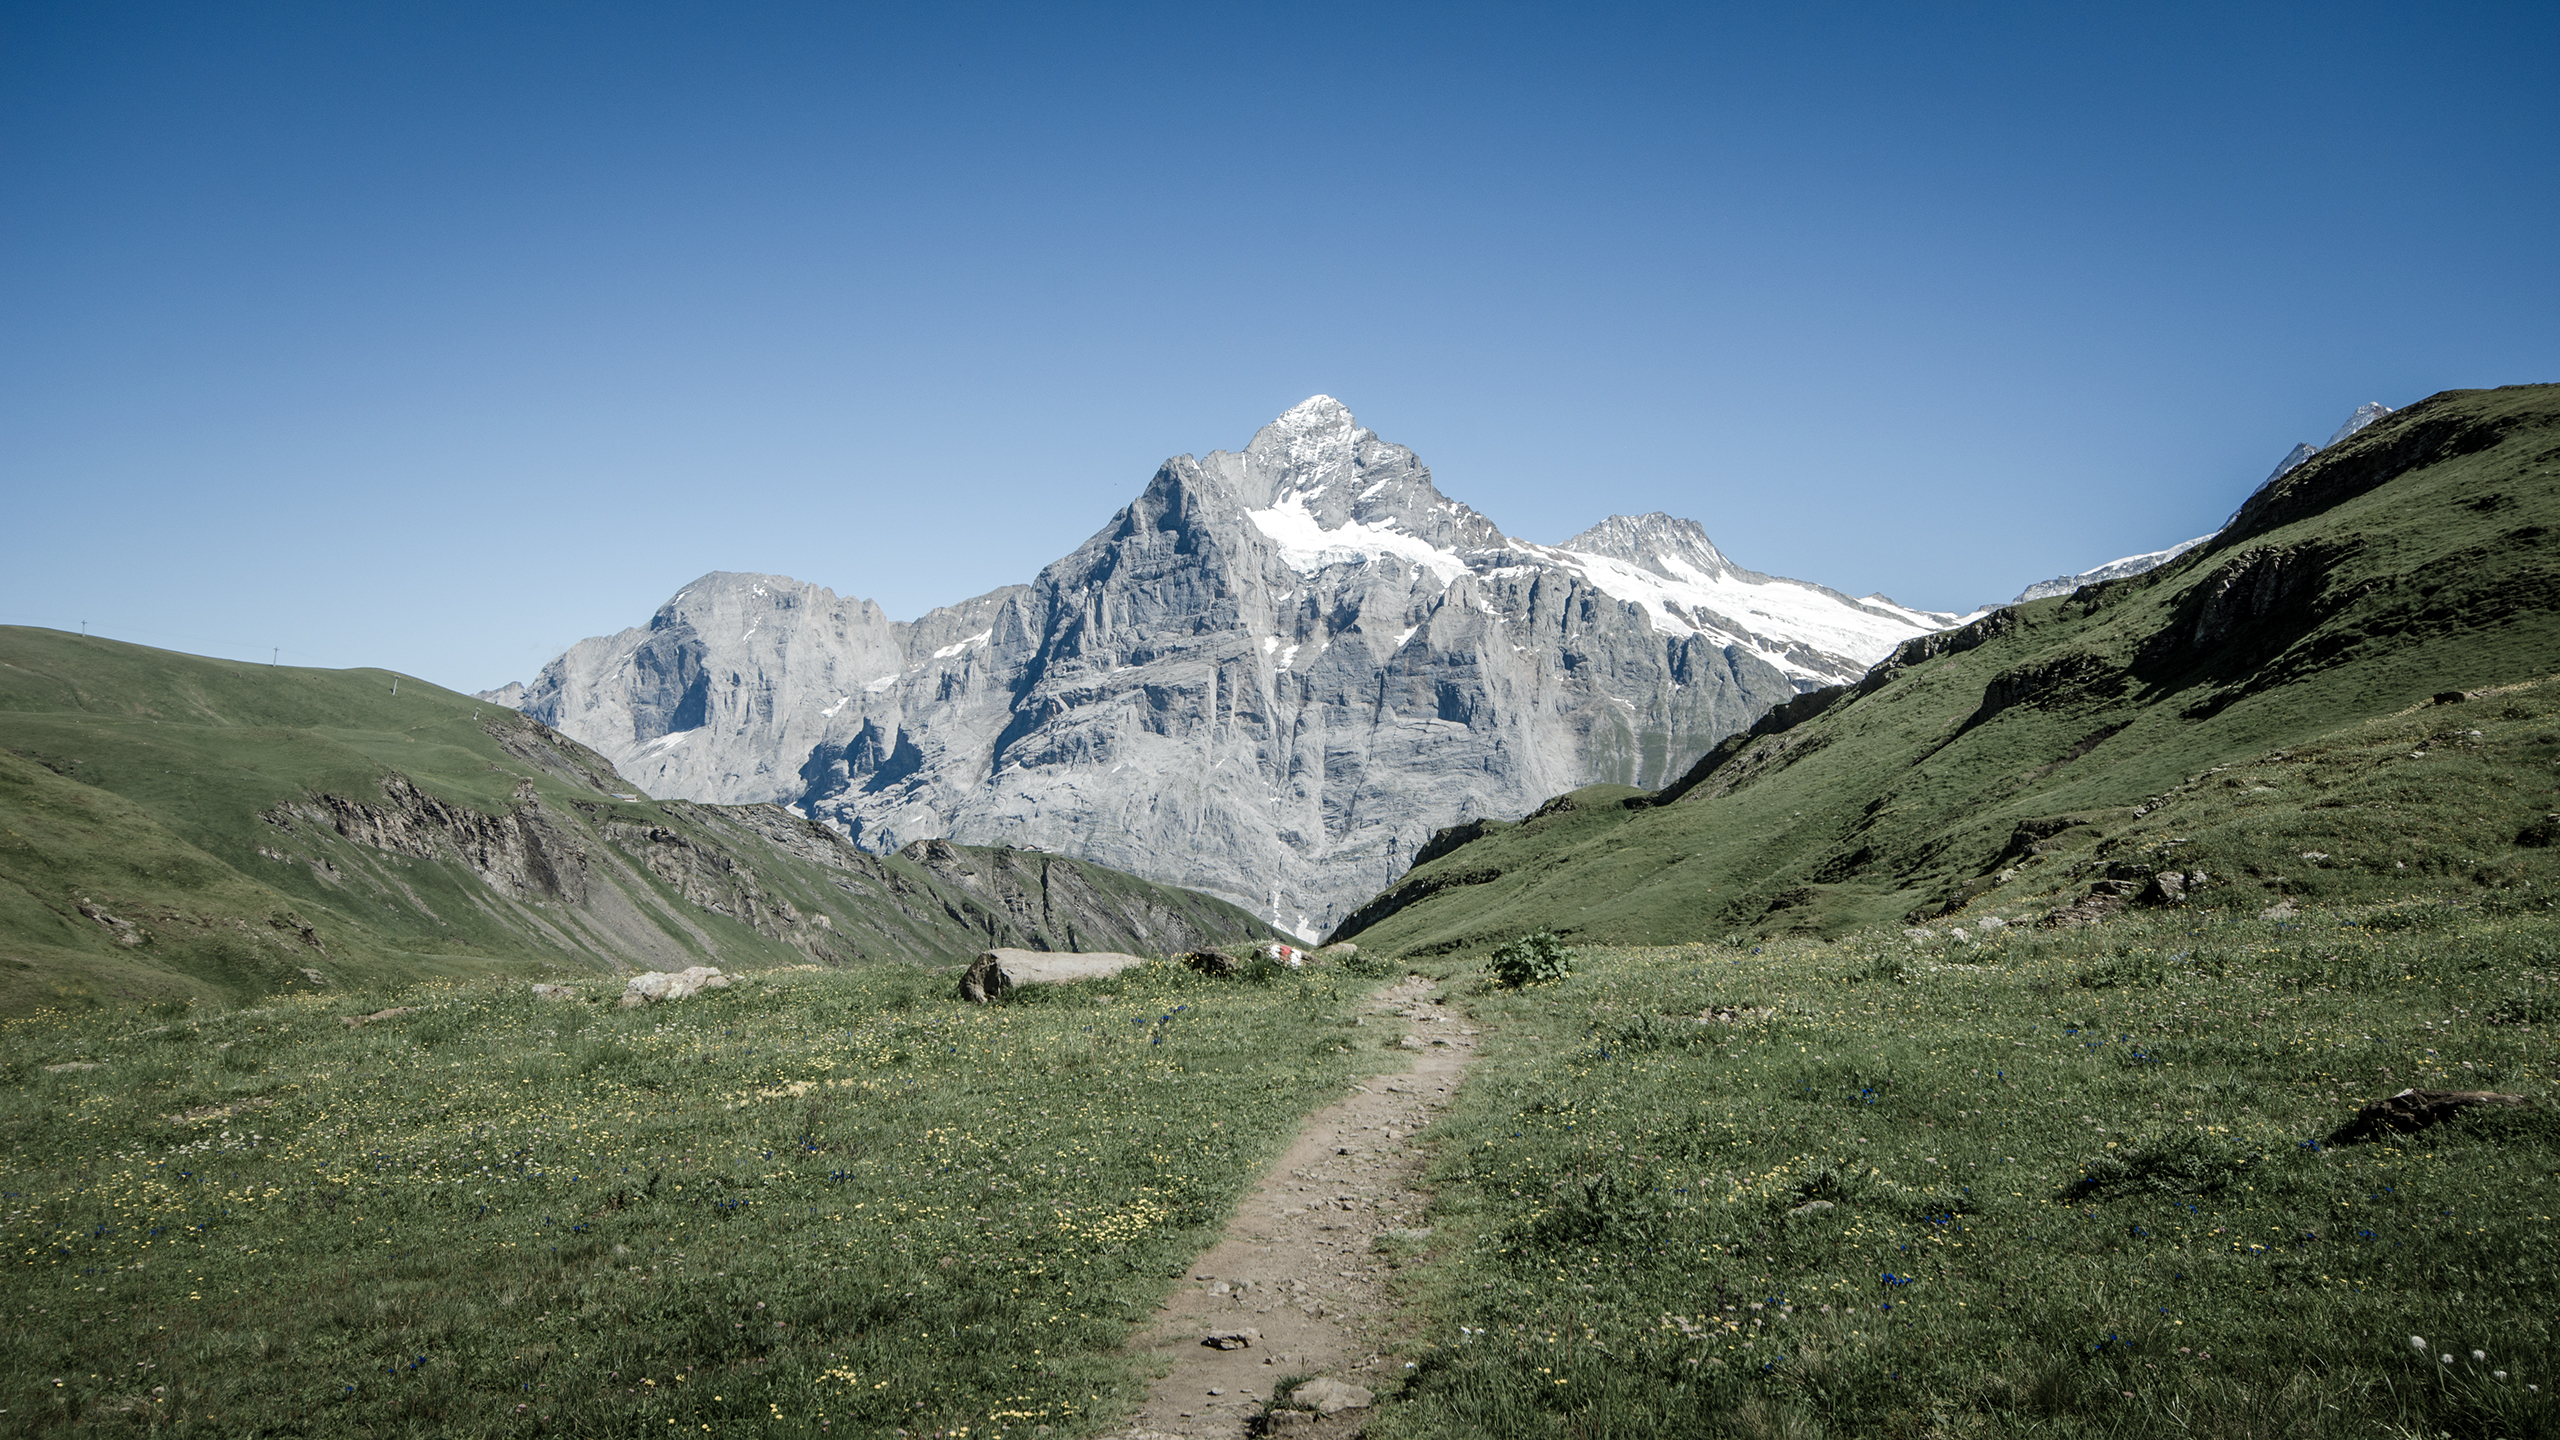 the_mountain_wallpaper_2560x1440